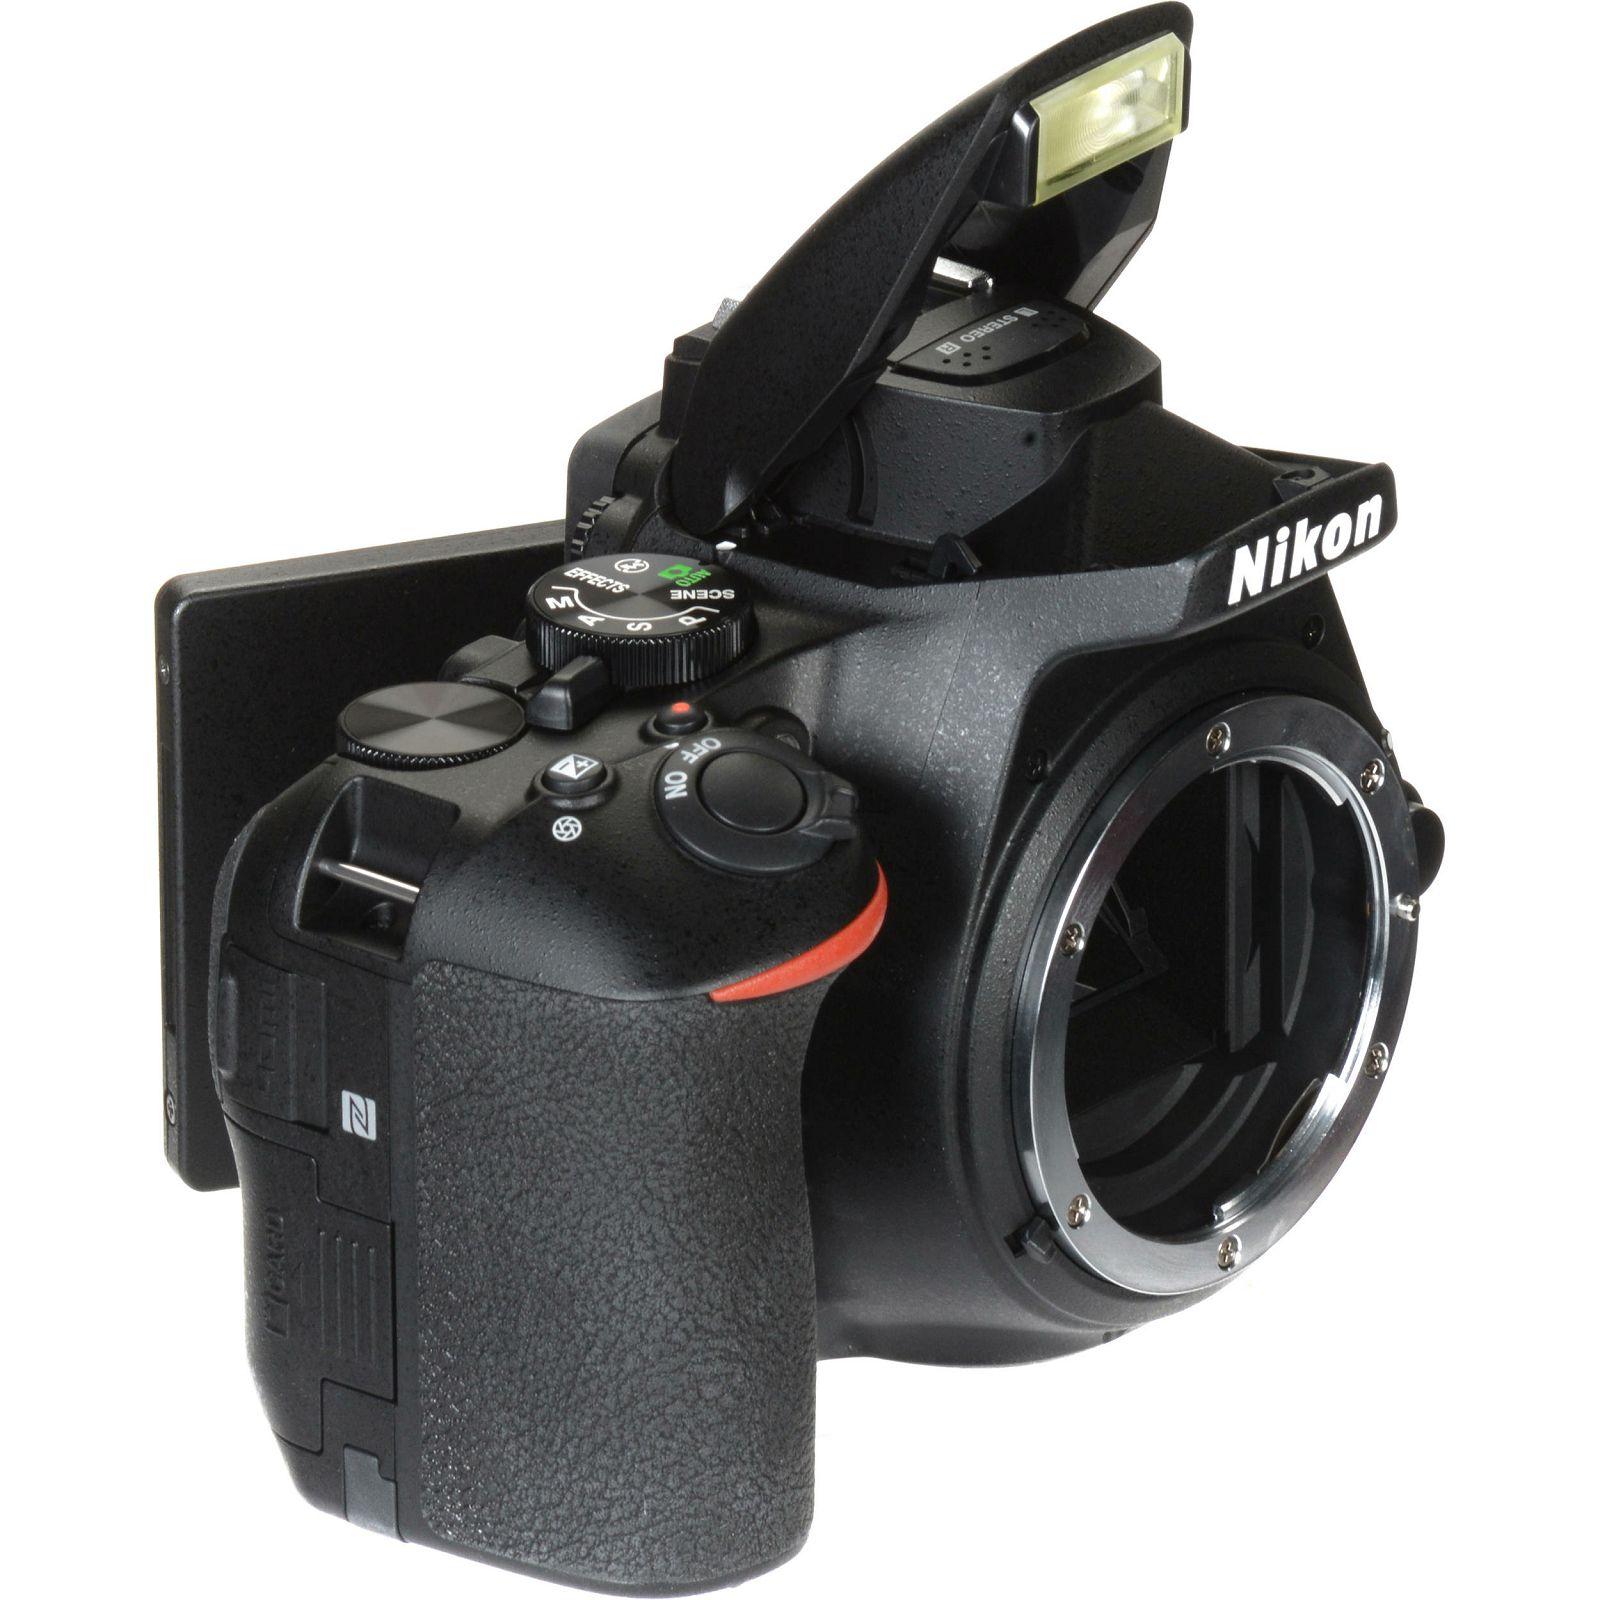 Nikon D5600 Af S 18 105 Vr Dx Kit Dslr Digitalni Fotoaparat Camera Lens Hood Flower 67mm Canon Fujifilm 135mm Sony 200mm 105mm